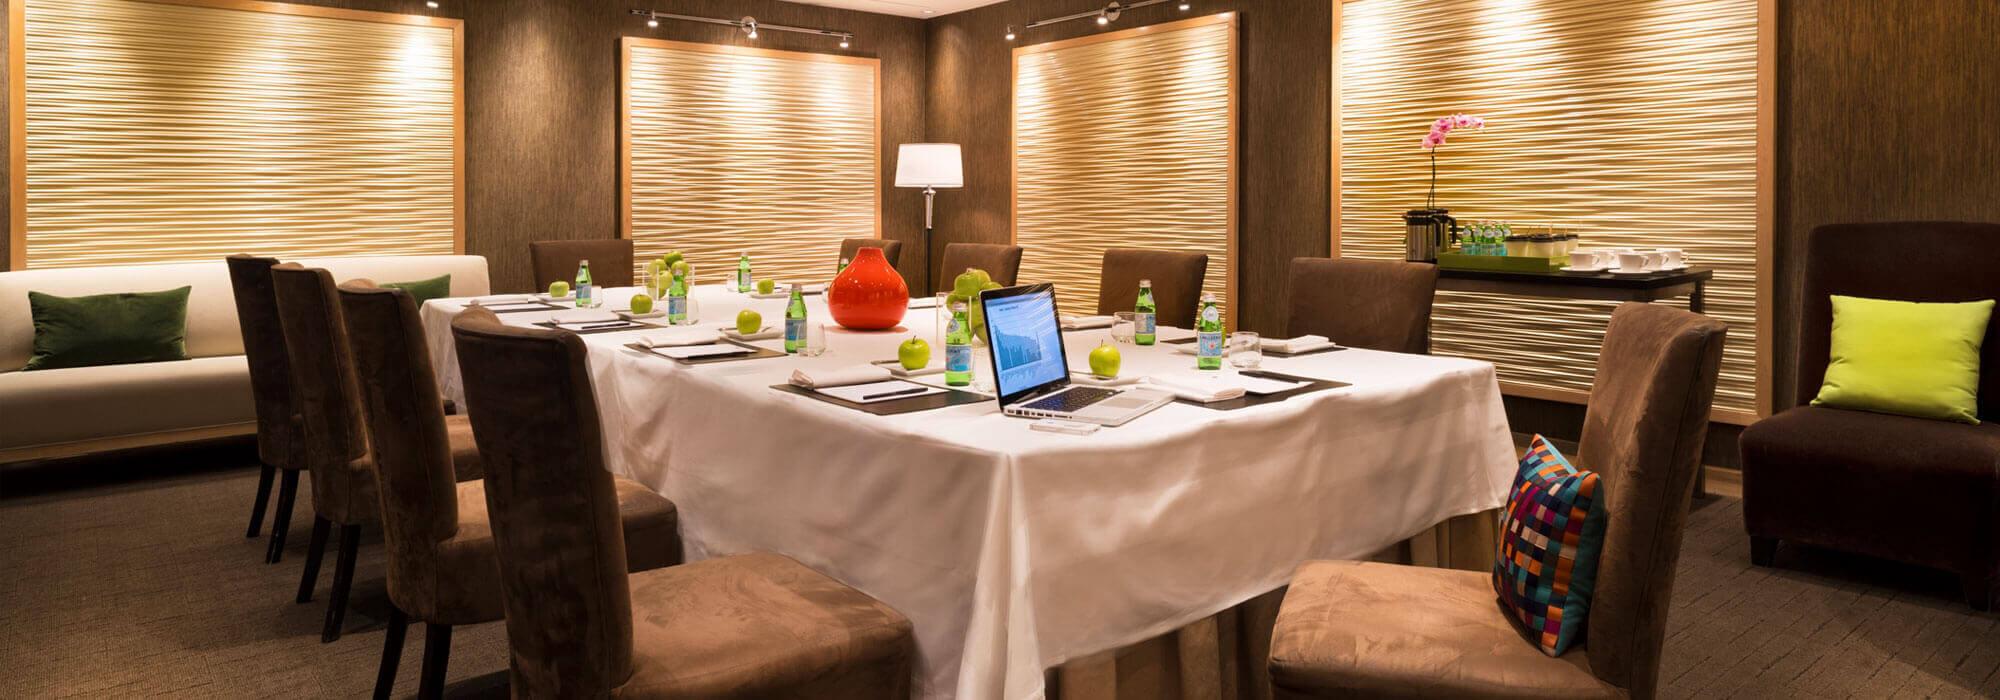 SoHo Hotel amenities Greenwich meeting space